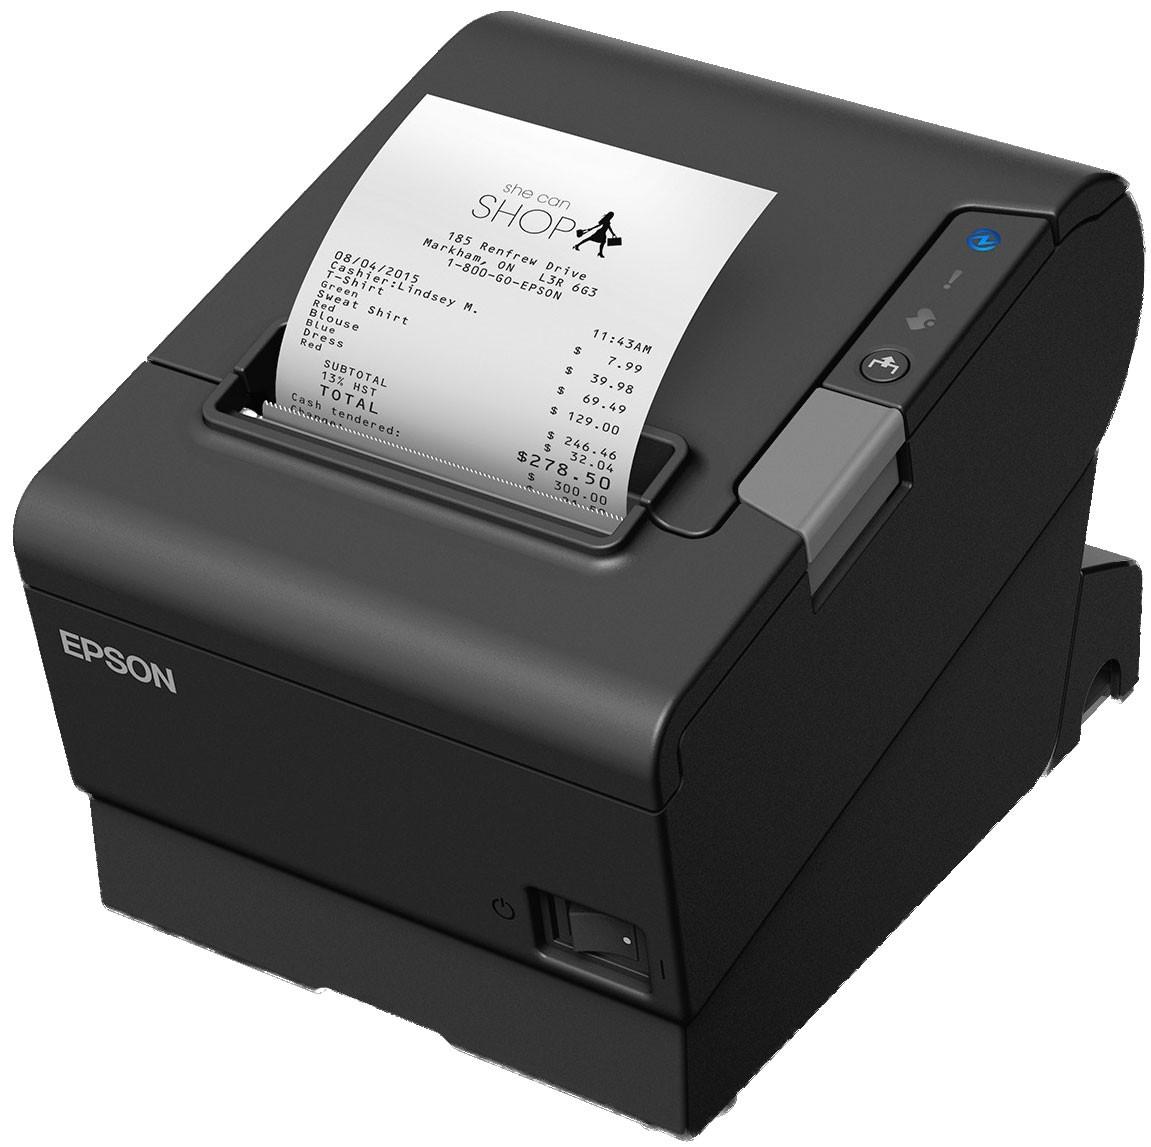 Epson TM-T88VI Ethernet Printer; no P/S; black (TM886G)